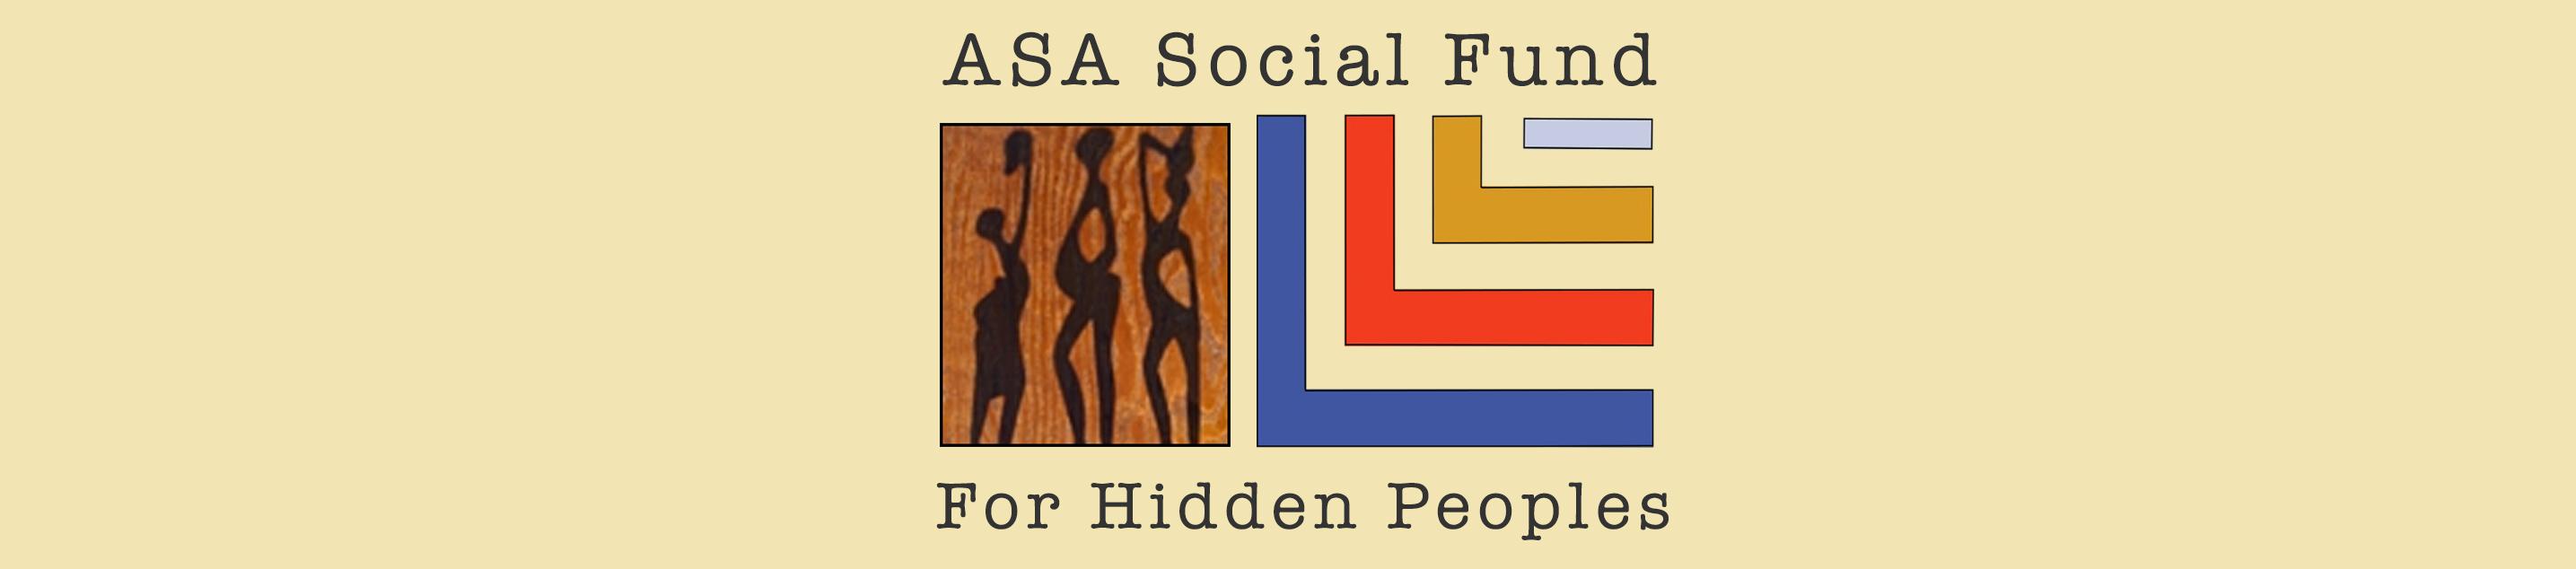 ASA-banner-new-logo-thin